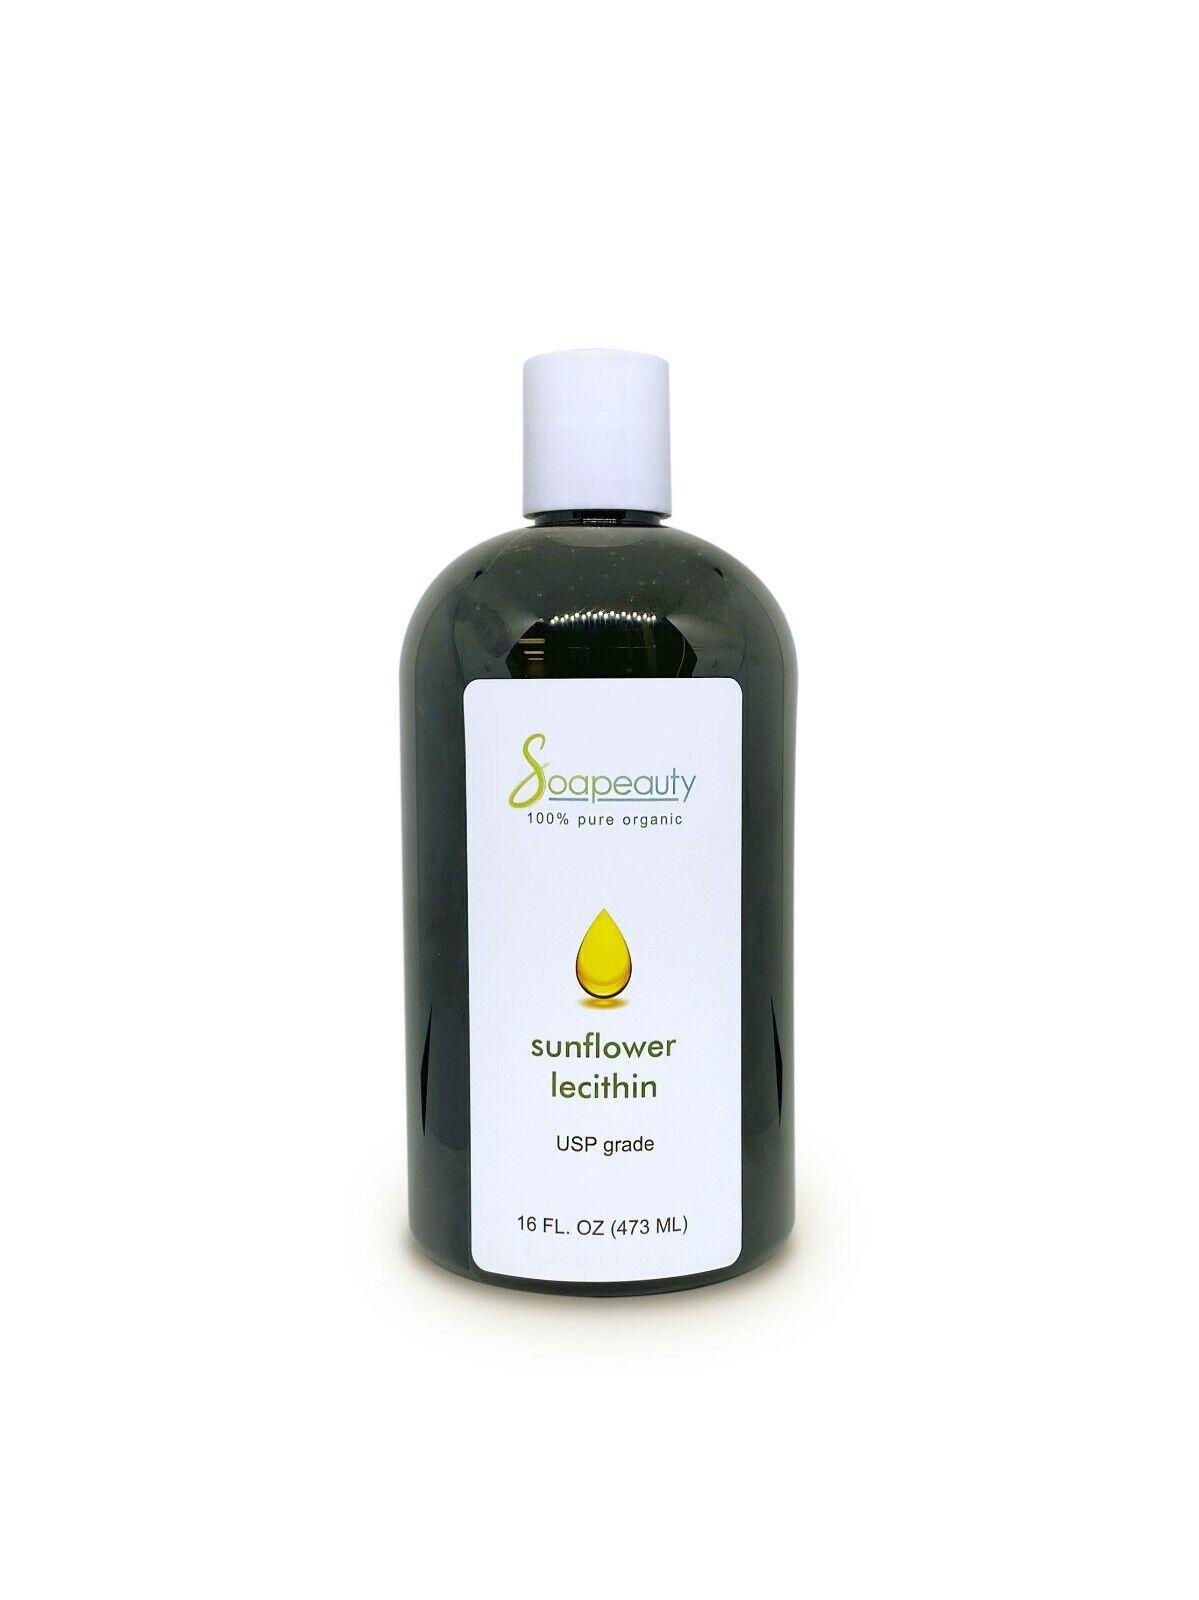 SUNFLOWER LECITHIN USP Grade Unbleached Fluid 100% Pure Natural Organic